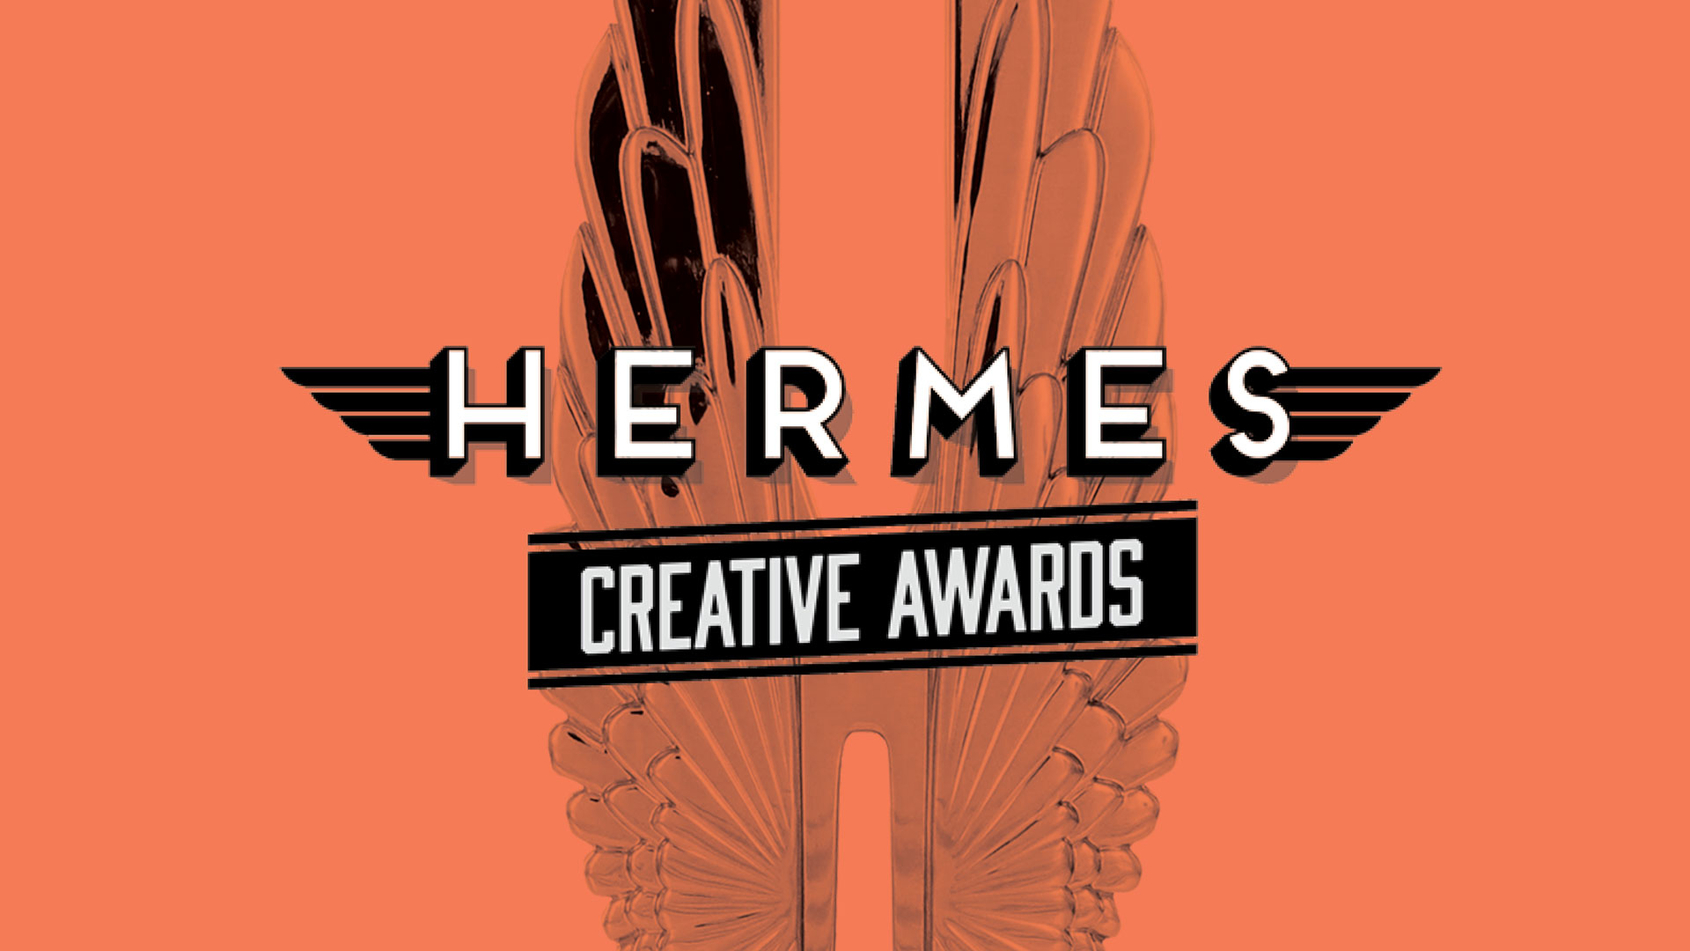 HermesAwards